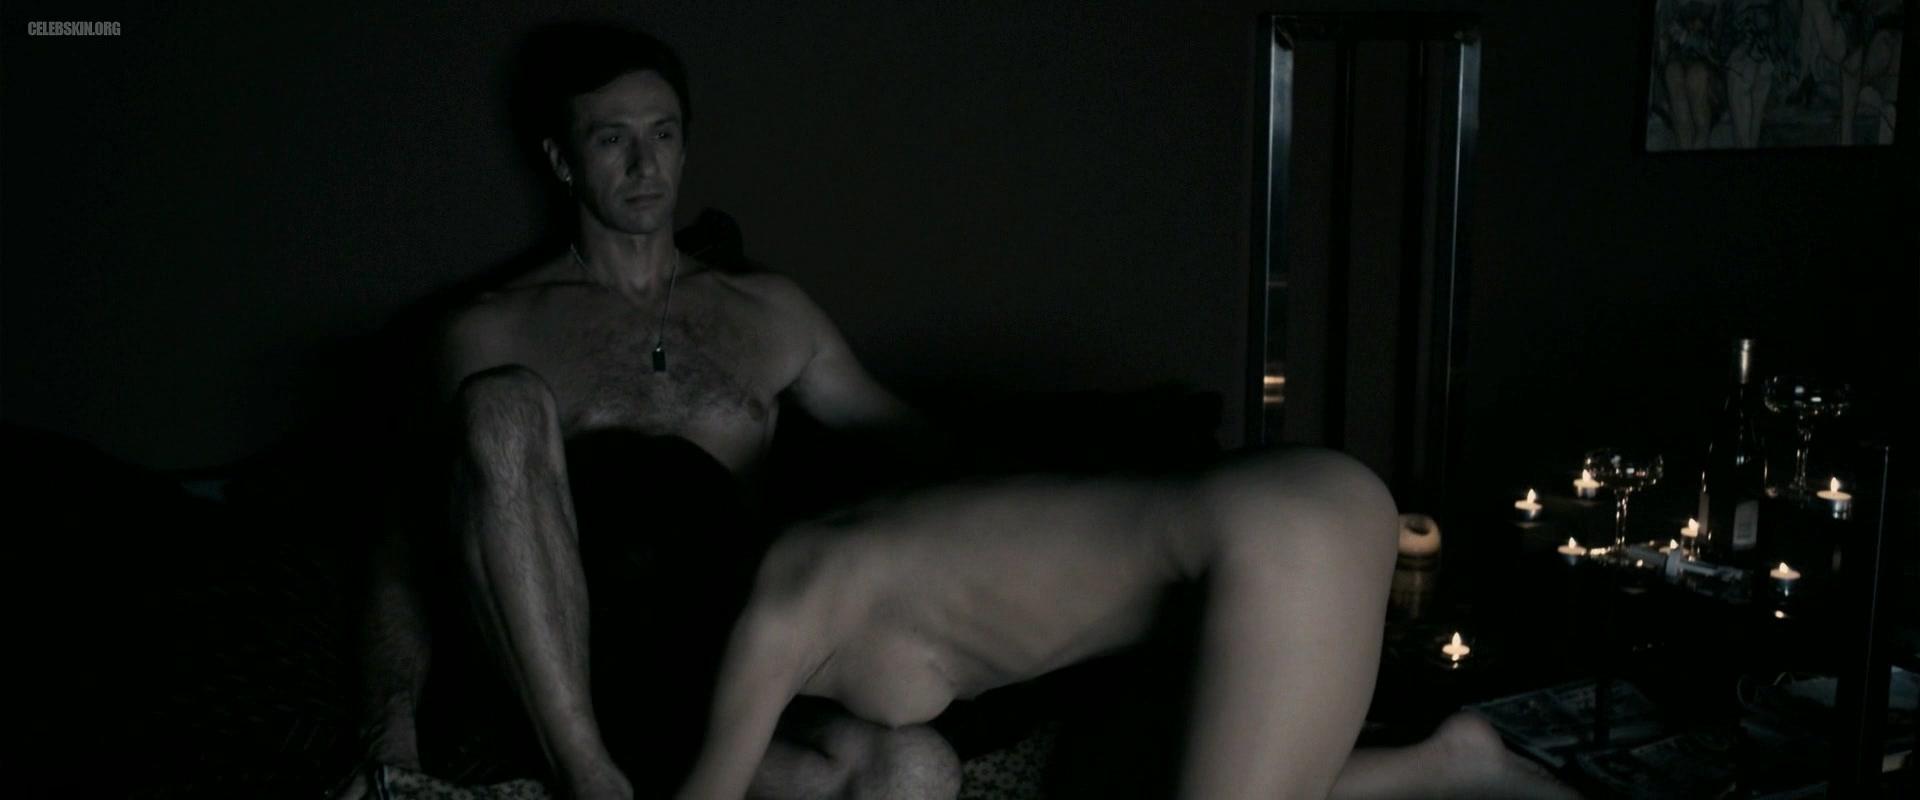 A Serbian Film Porno srpski film 4 - celebs roulette tube